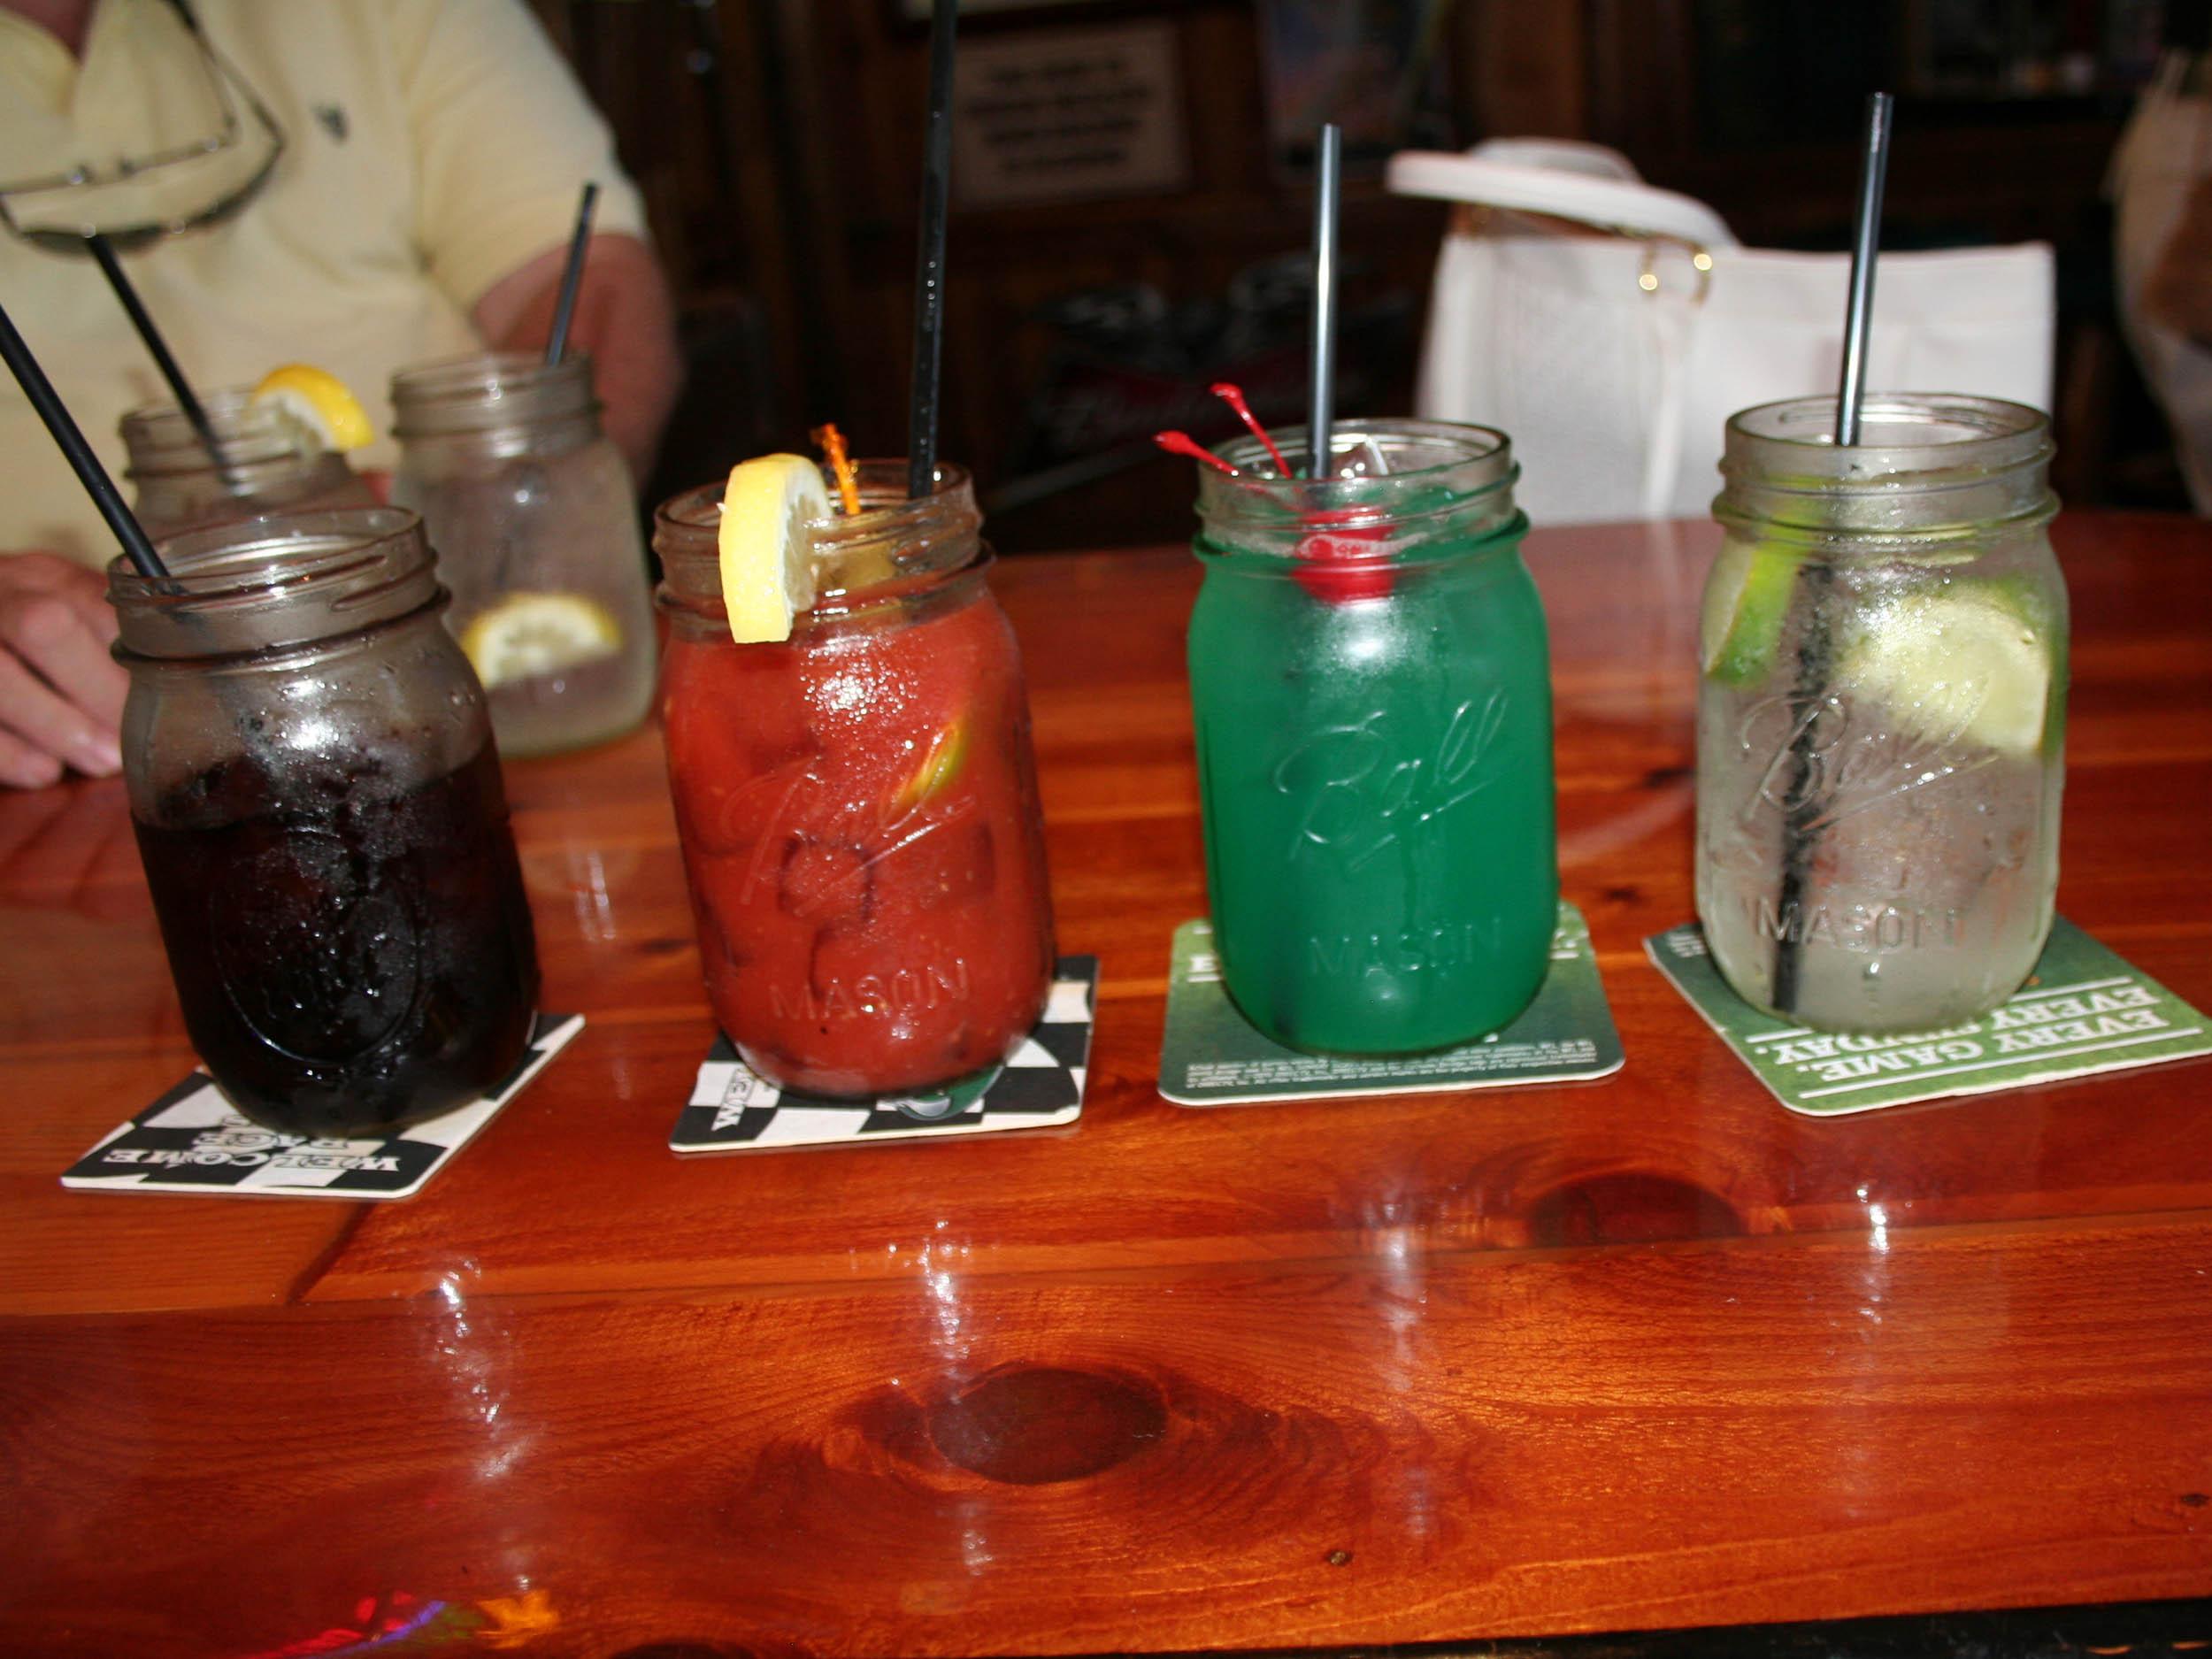 Ocean Deck Restaurant and Beach Club Mason Jar Drinks